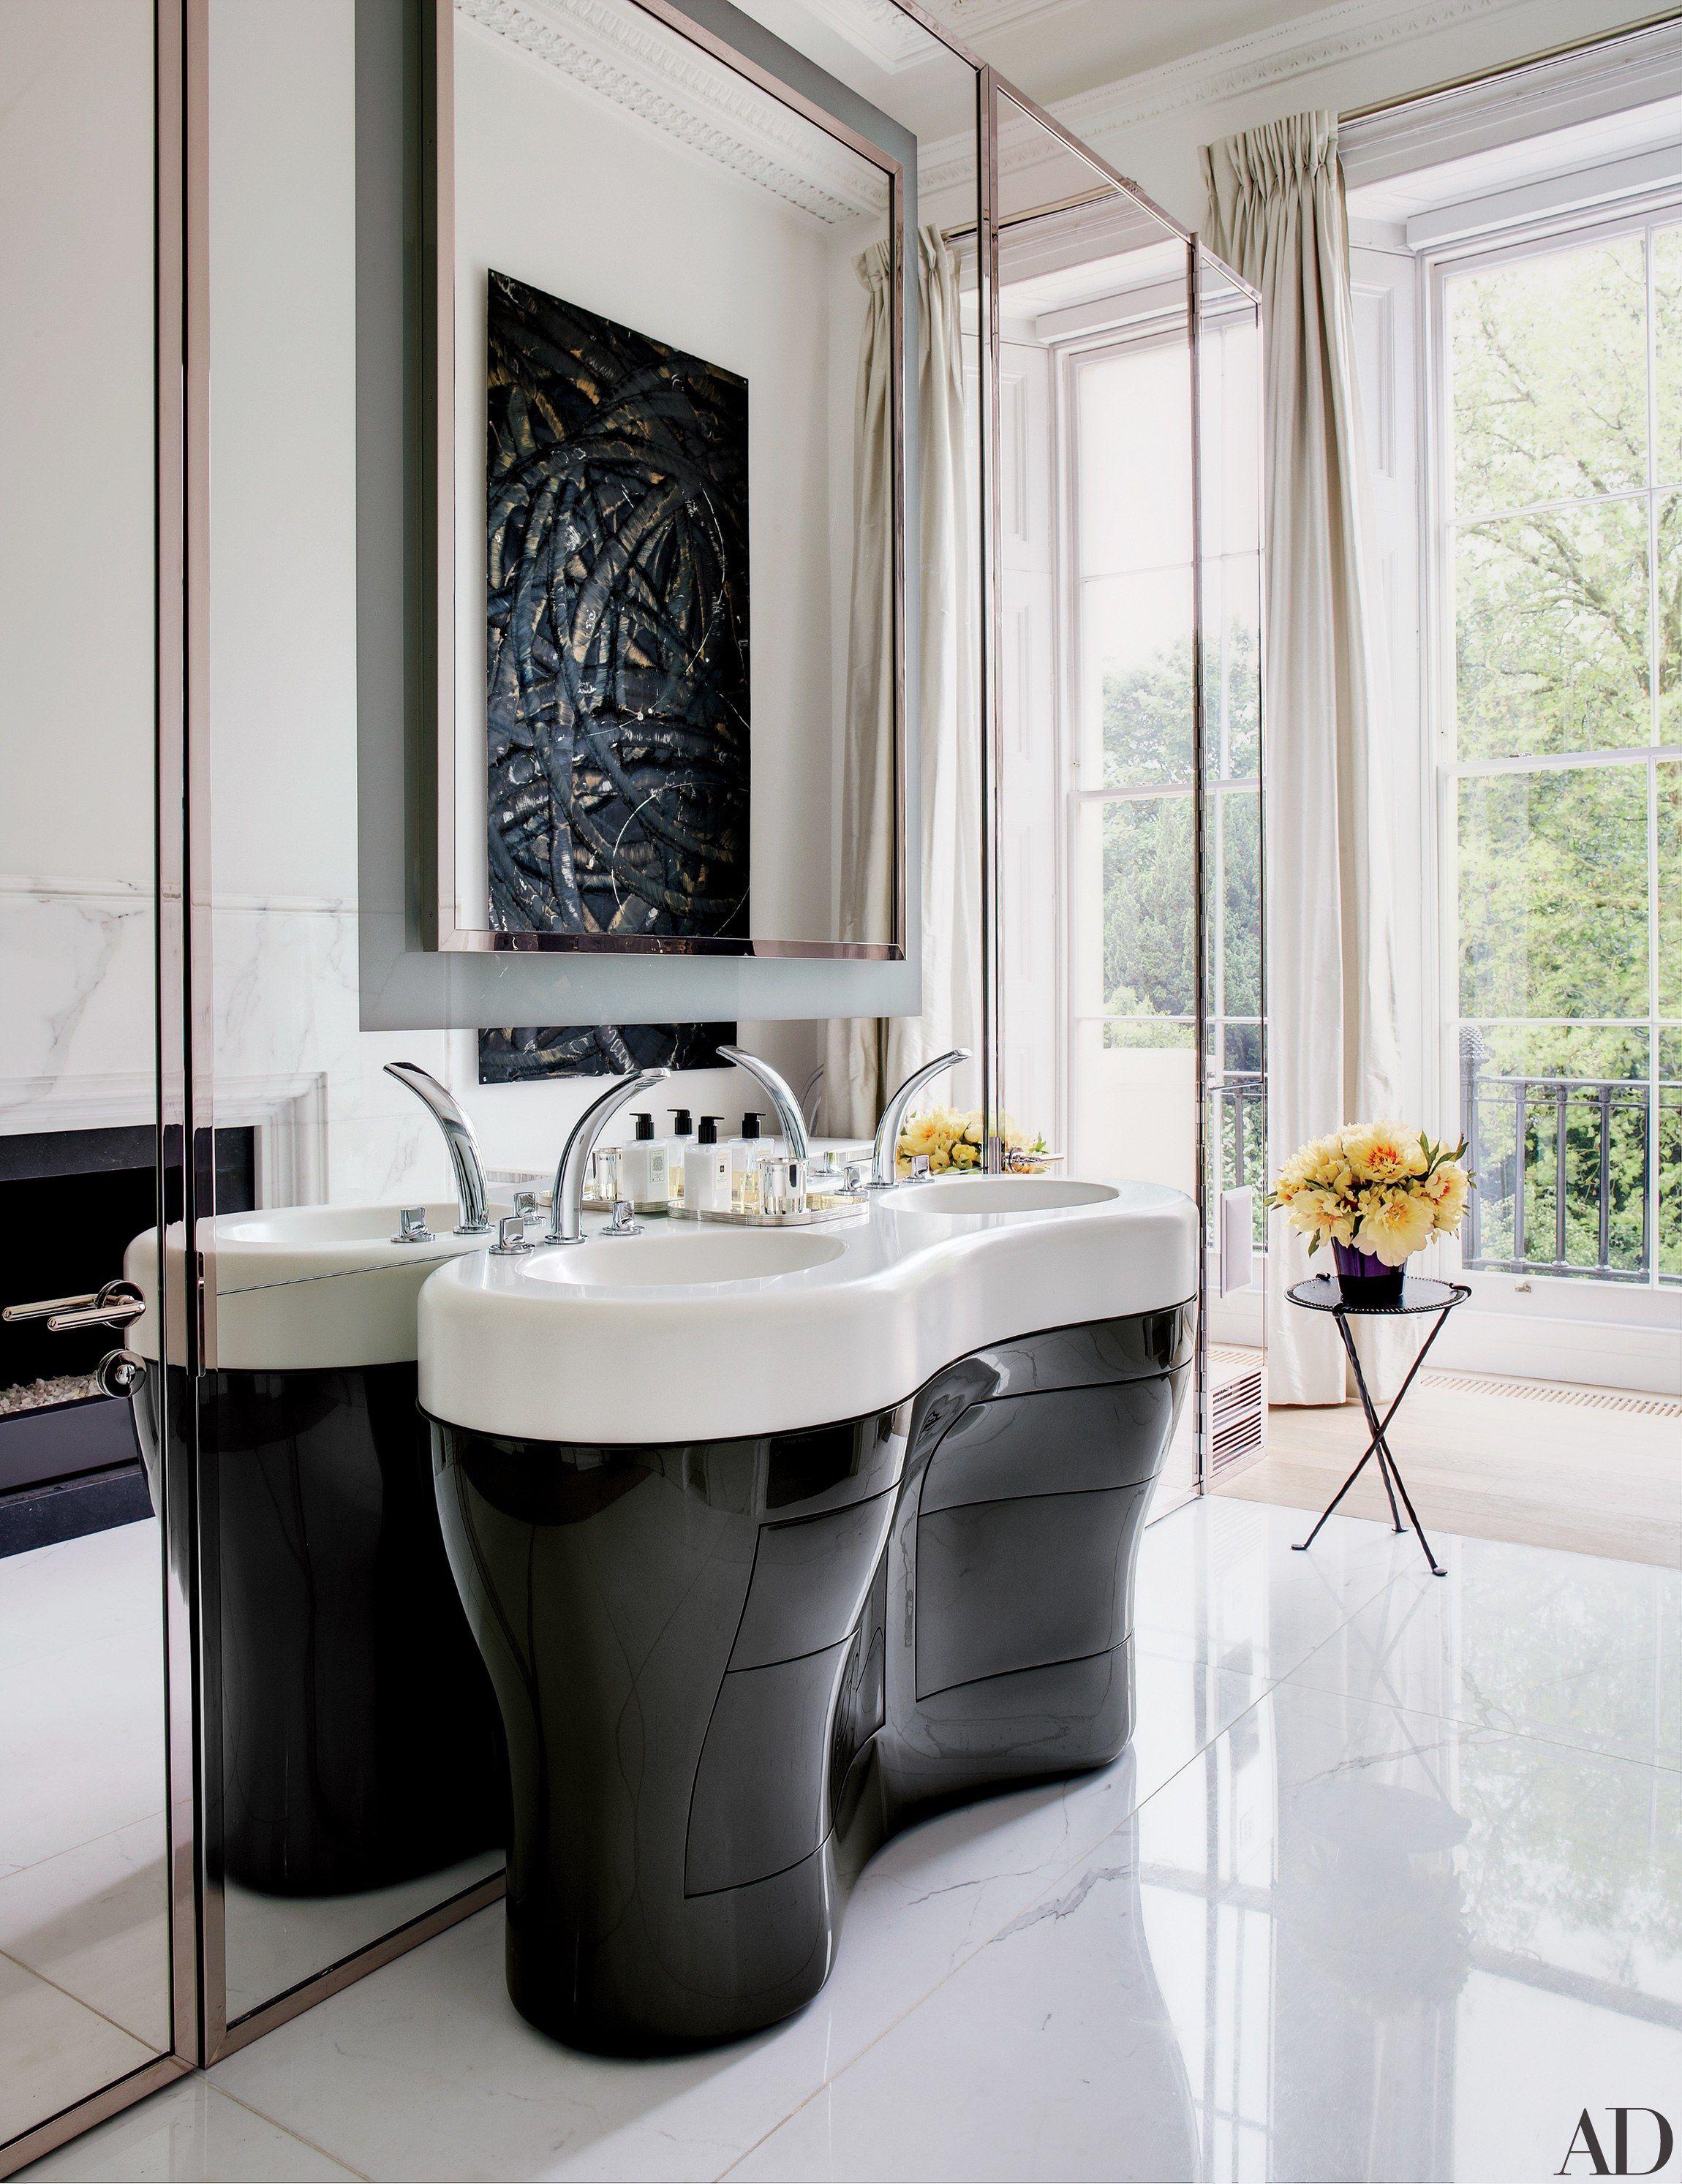 16 rooms for black and white decor inspiration interior design rh pinterest com